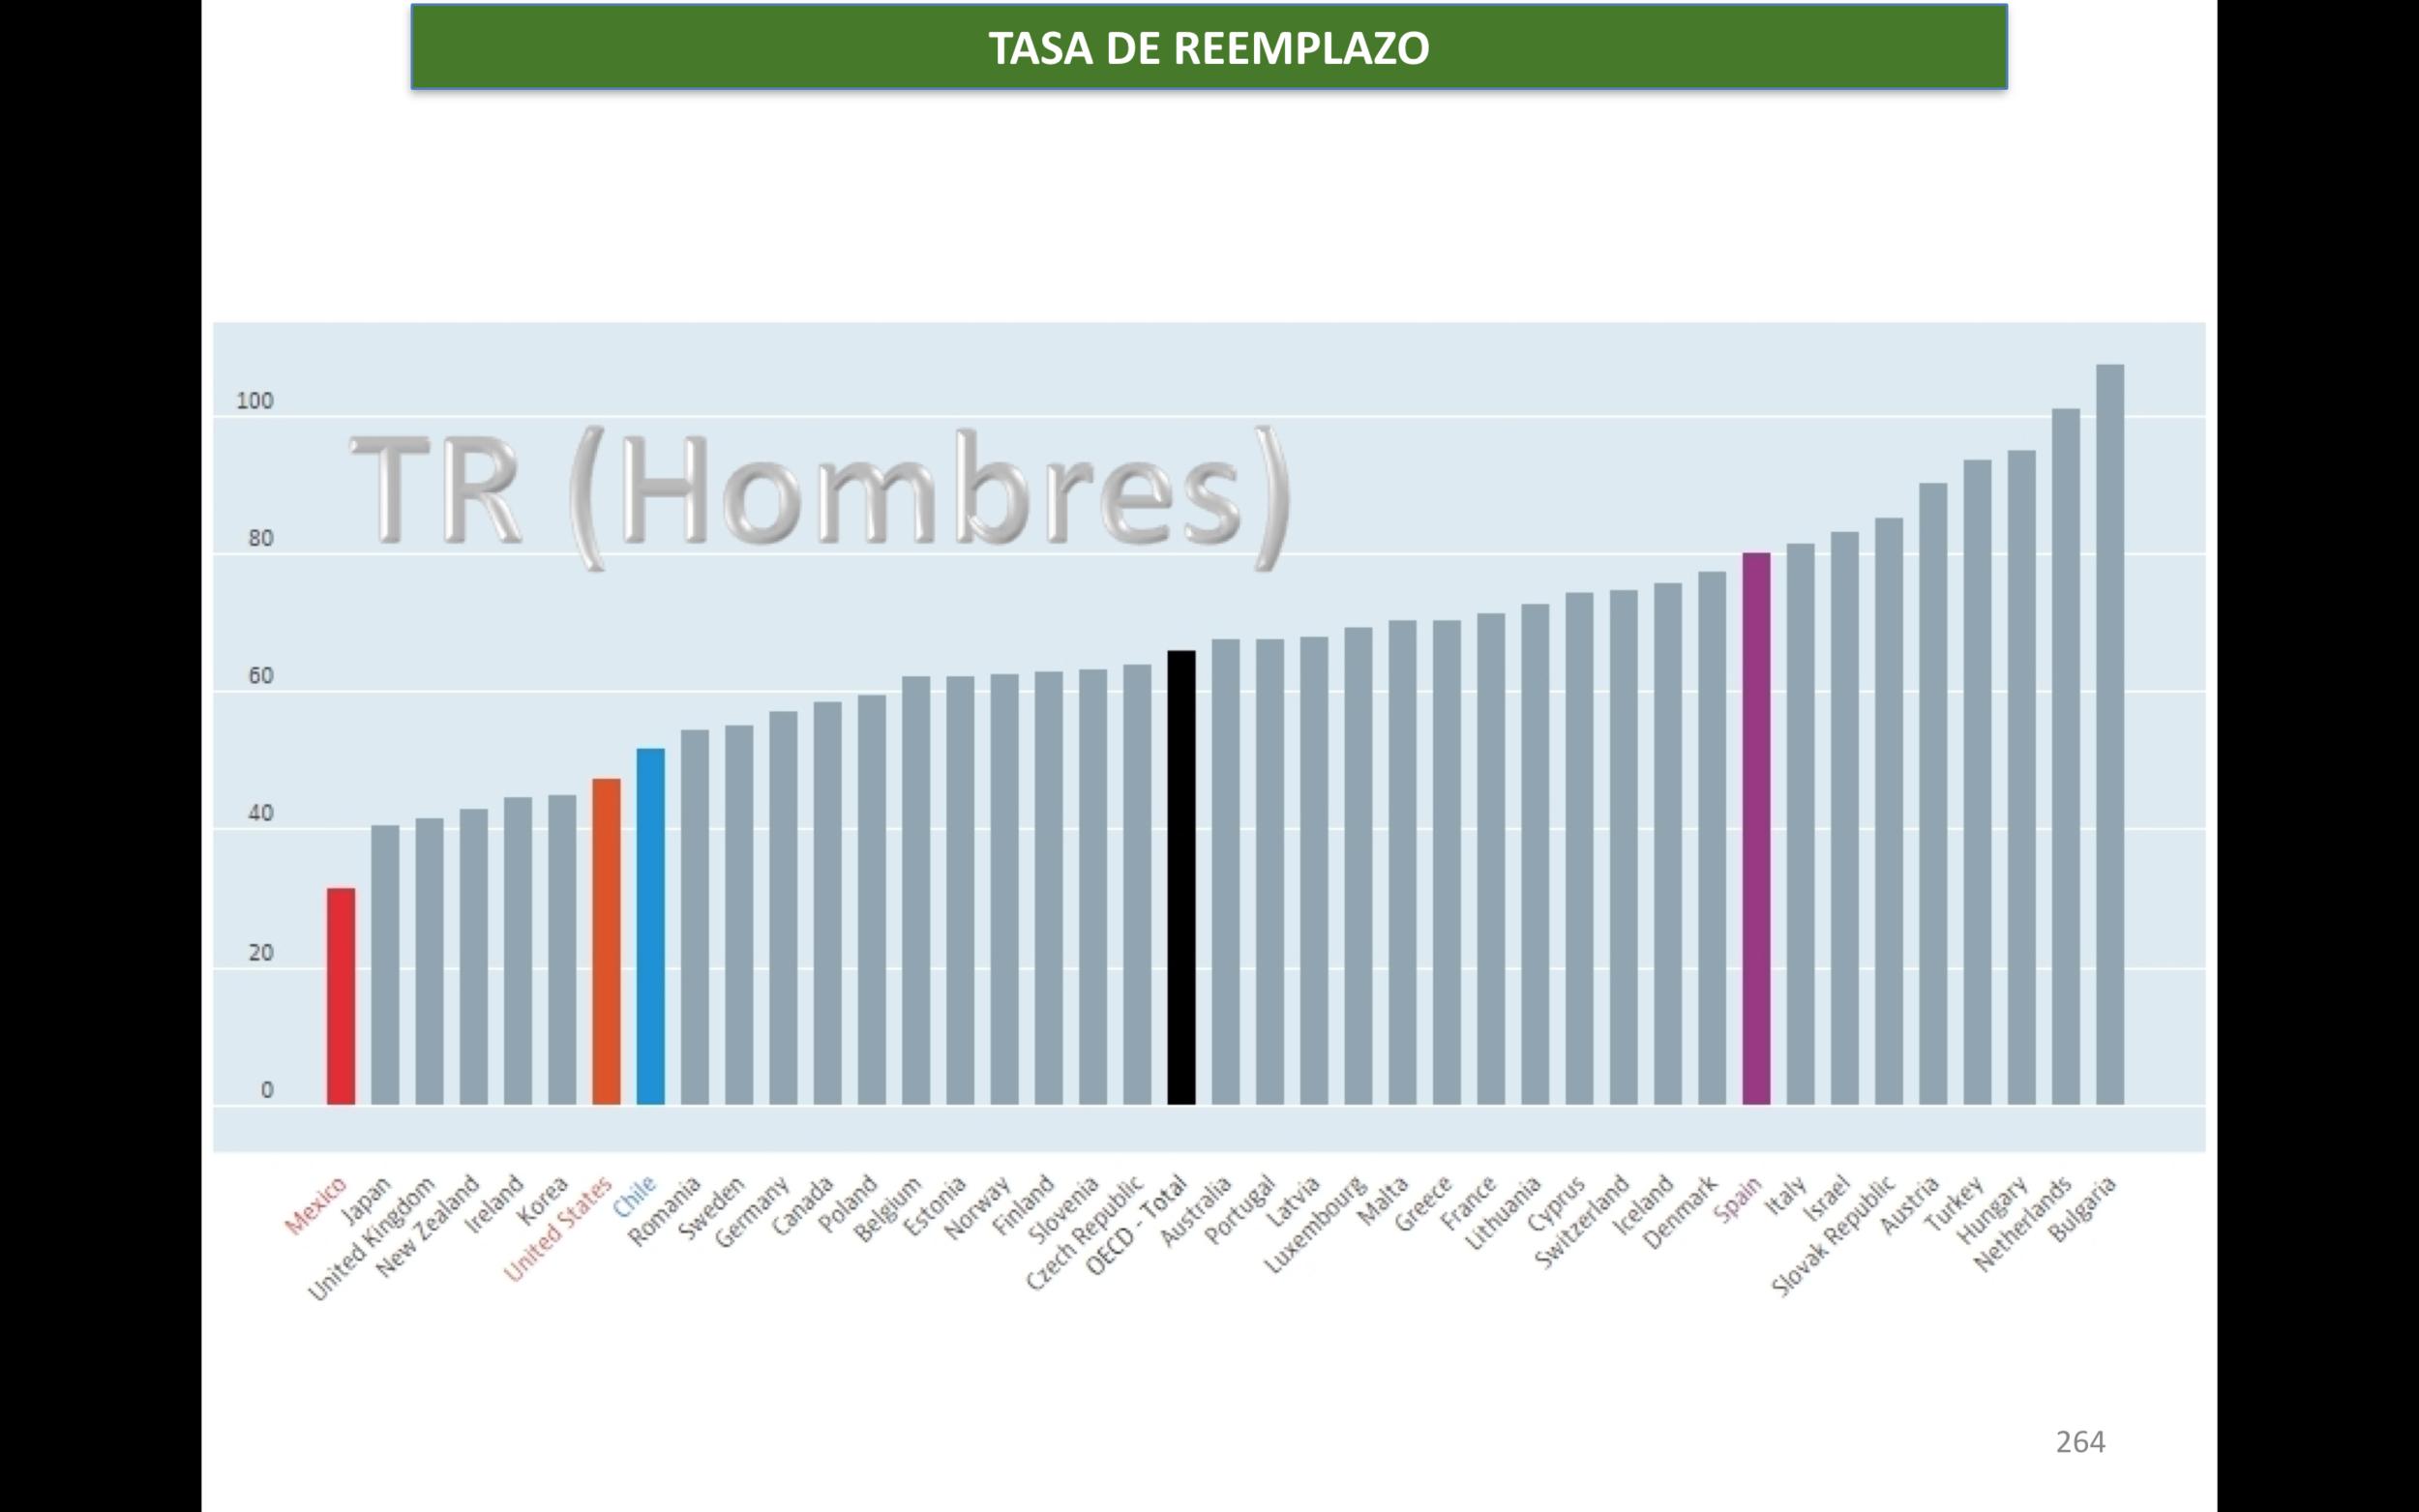 OECD (2015), Tasa Neta de Reemplazo para hombres